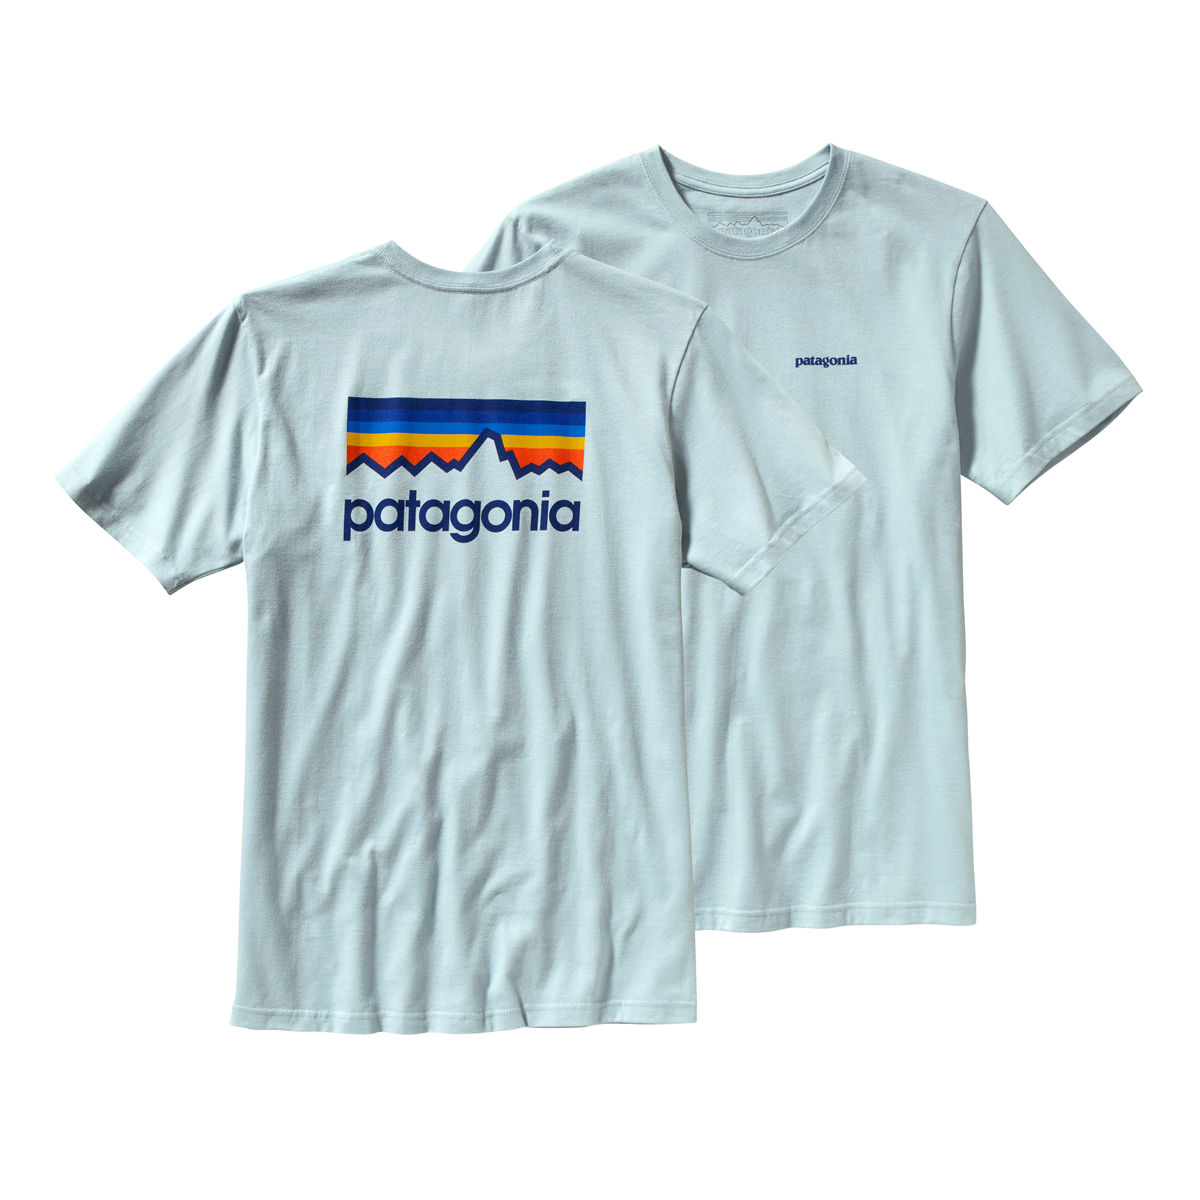 patagonia line logo t shirt 2015 t shirts shirts tops. Black Bedroom Furniture Sets. Home Design Ideas